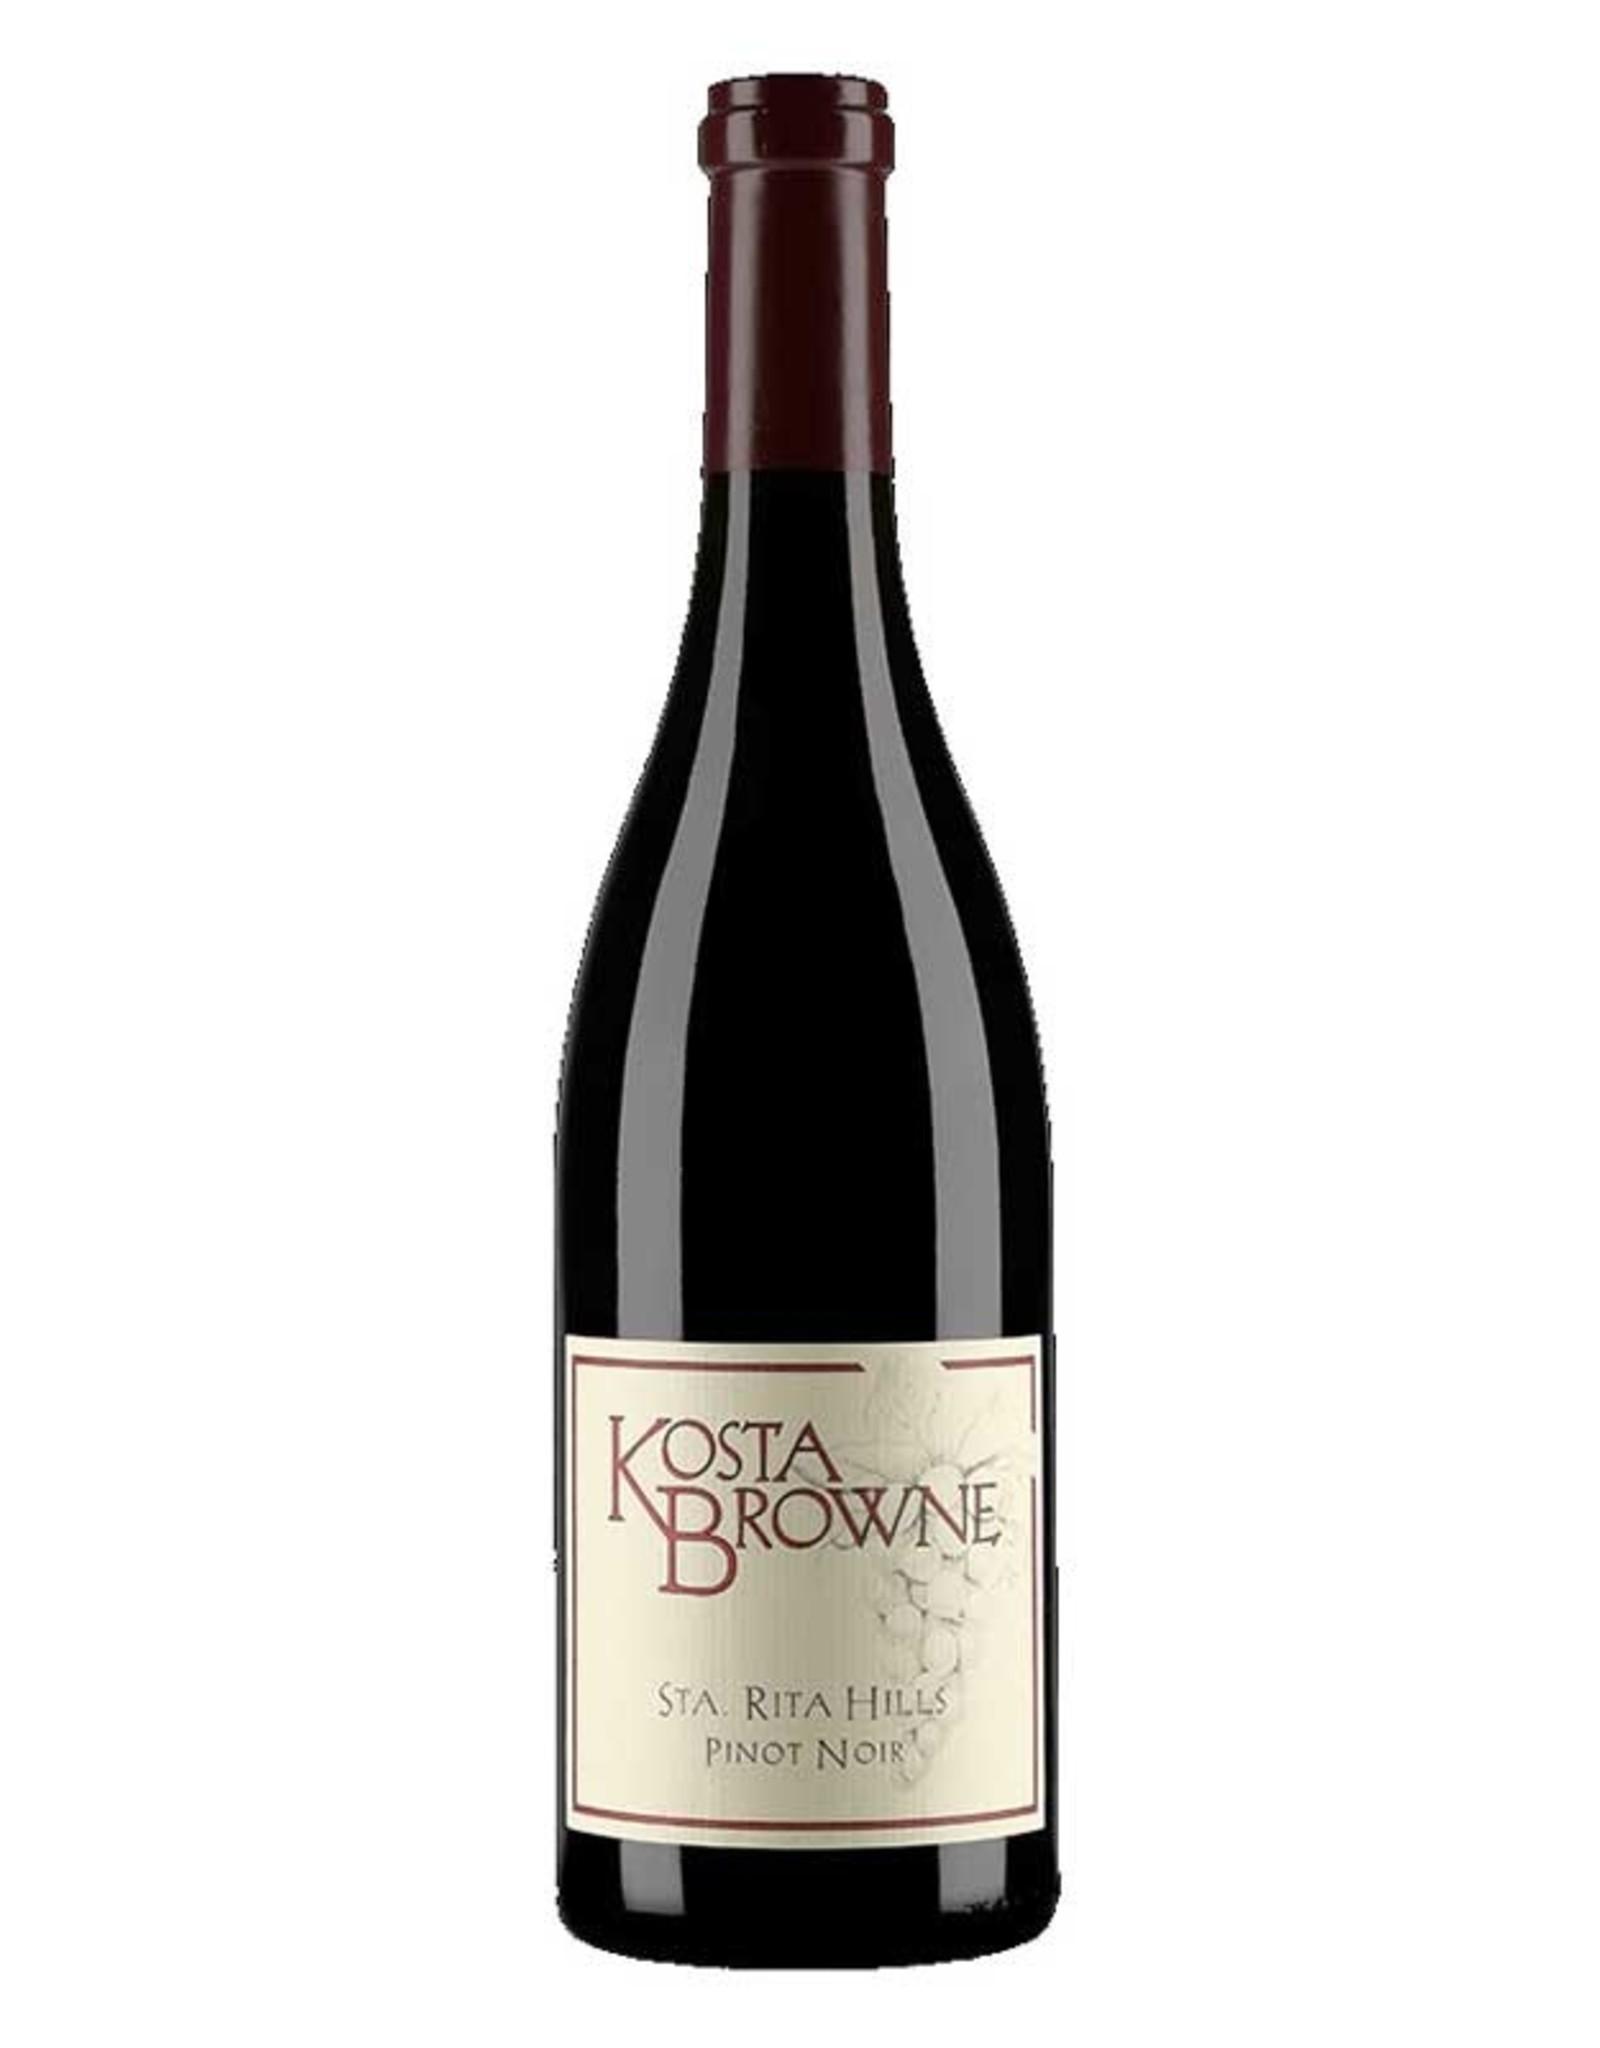 Kosta Browne Sta. Rita Hills Pinot Noir